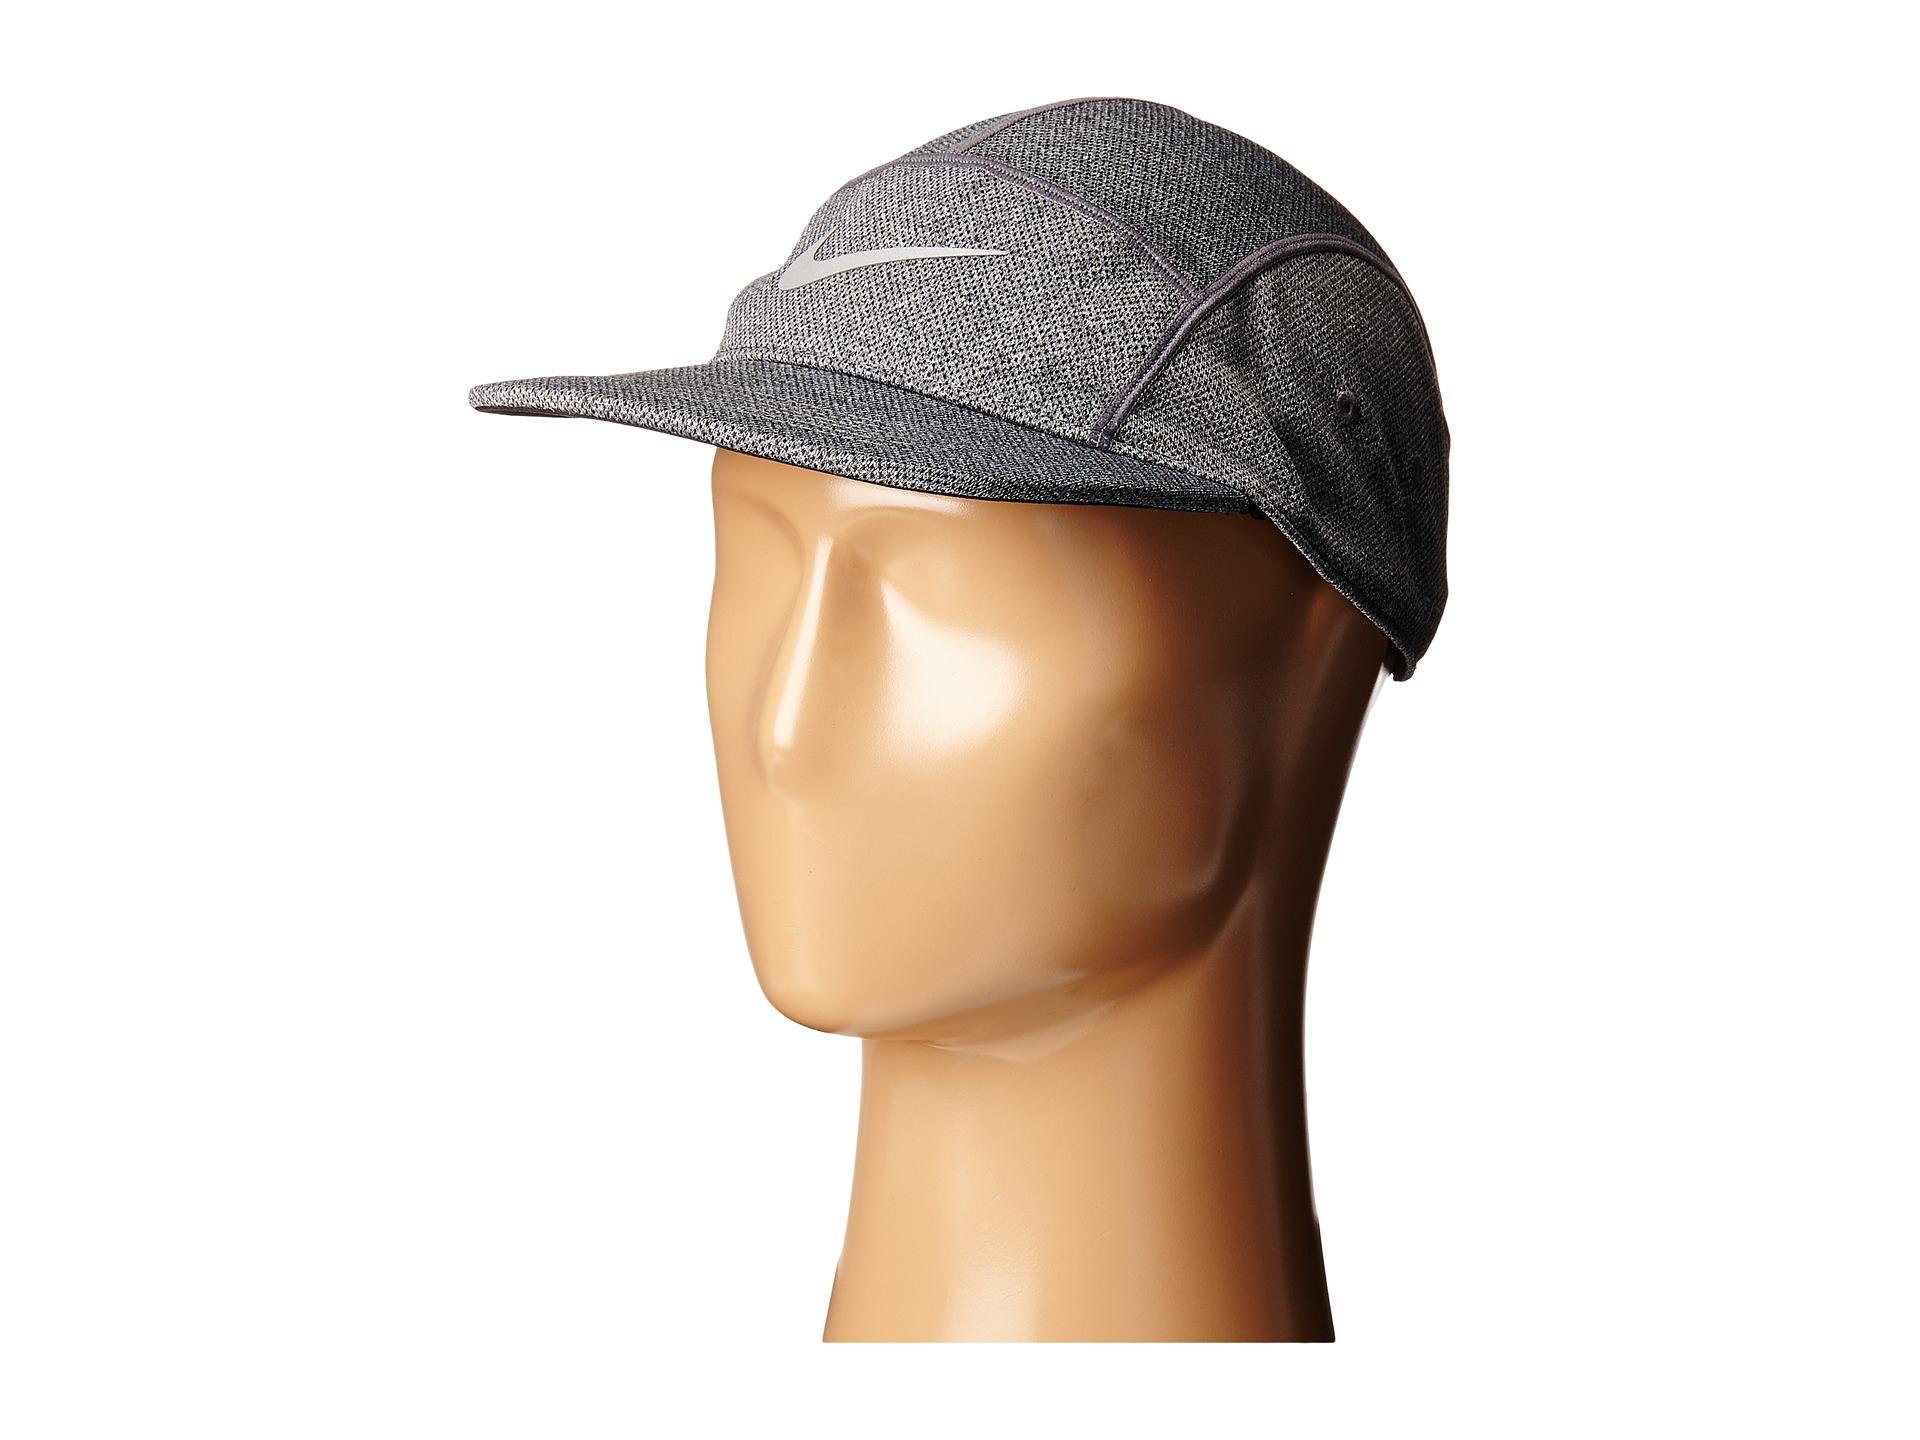 Lyst - Nike Run Dri-fit Knit Aw84 Hat in Metallic for Men 6fc9ee038b6